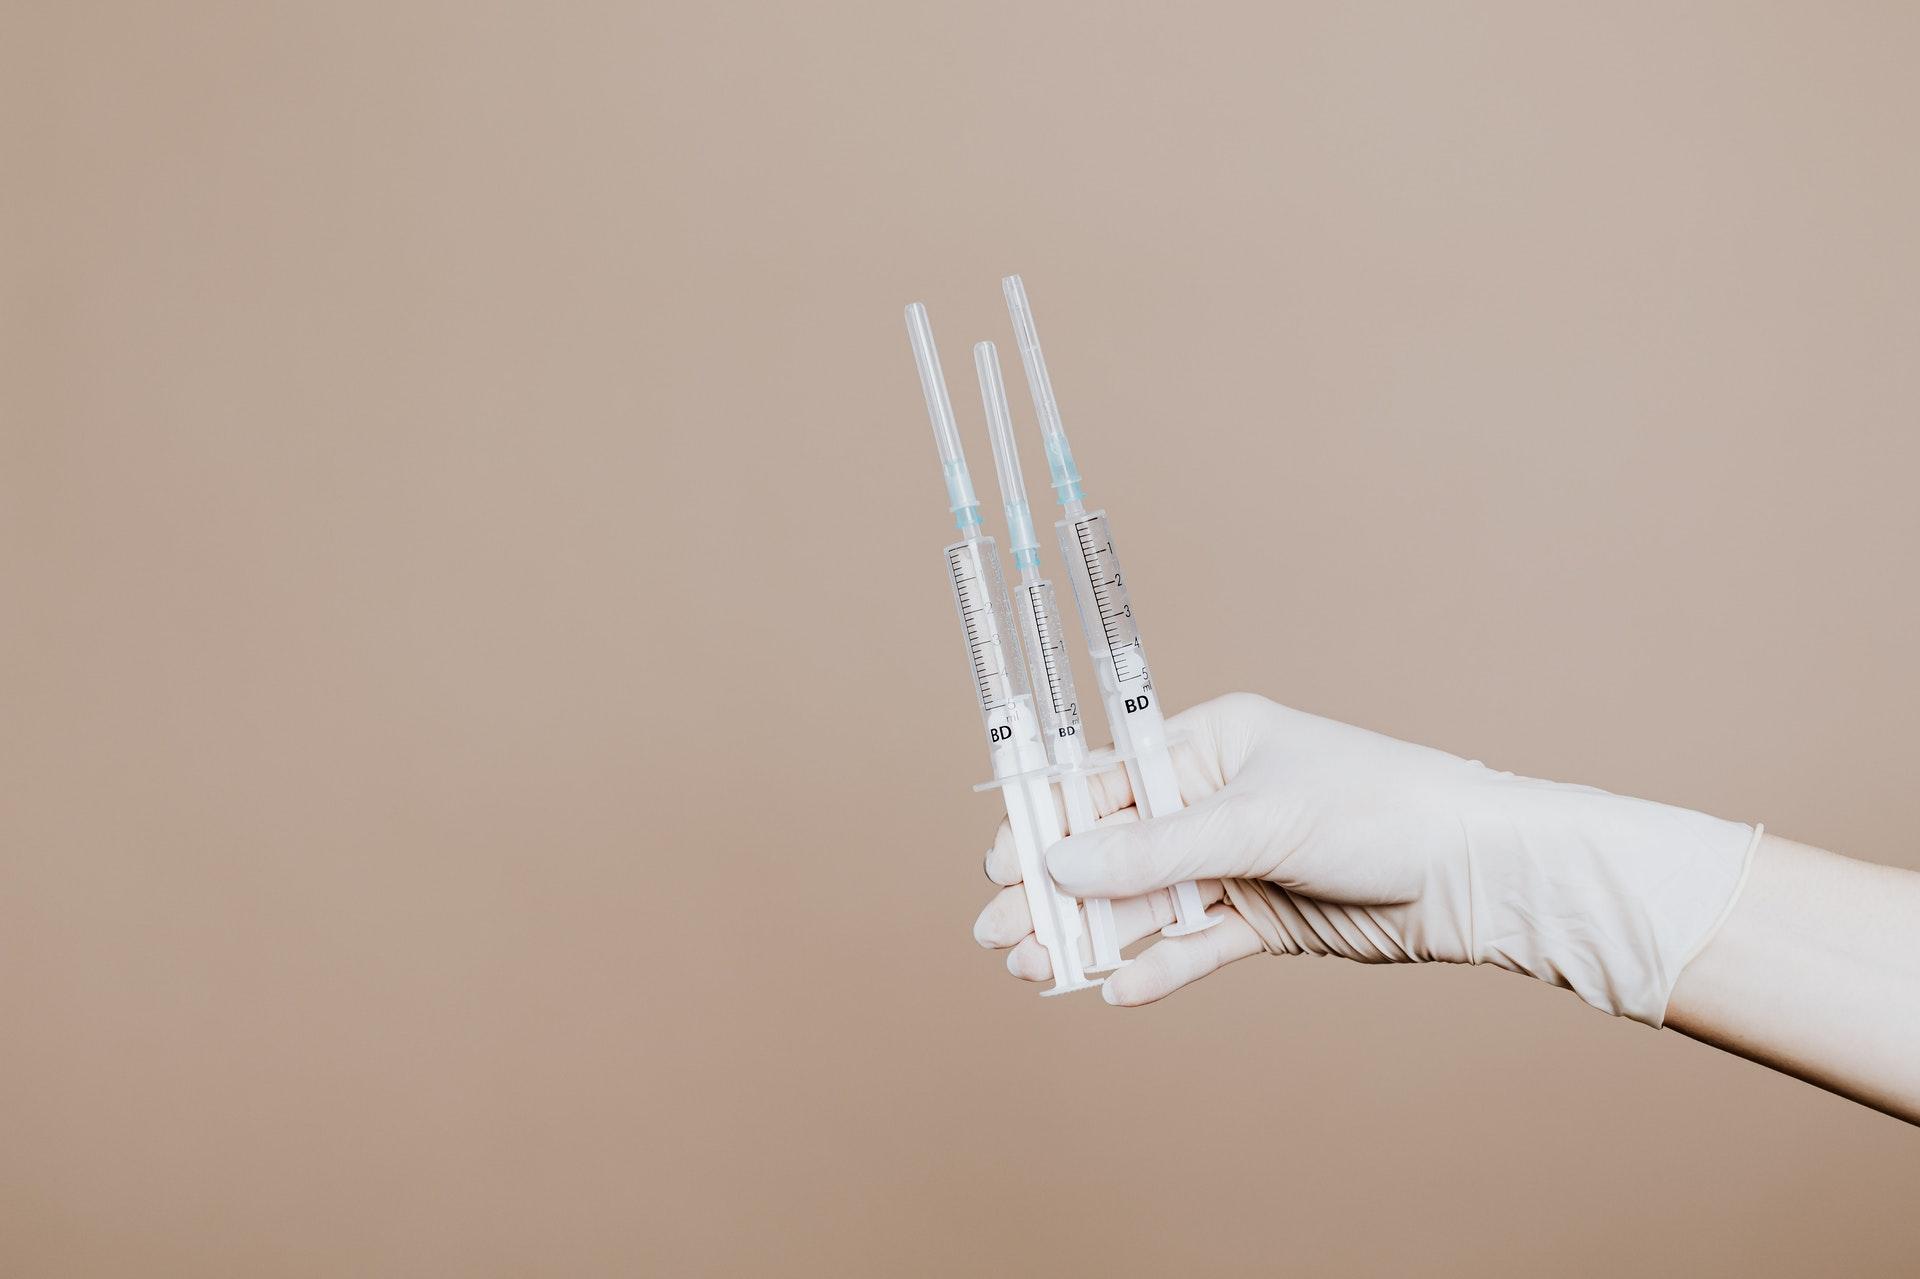 gloved hand holding hypodermic needles against plain backdrop